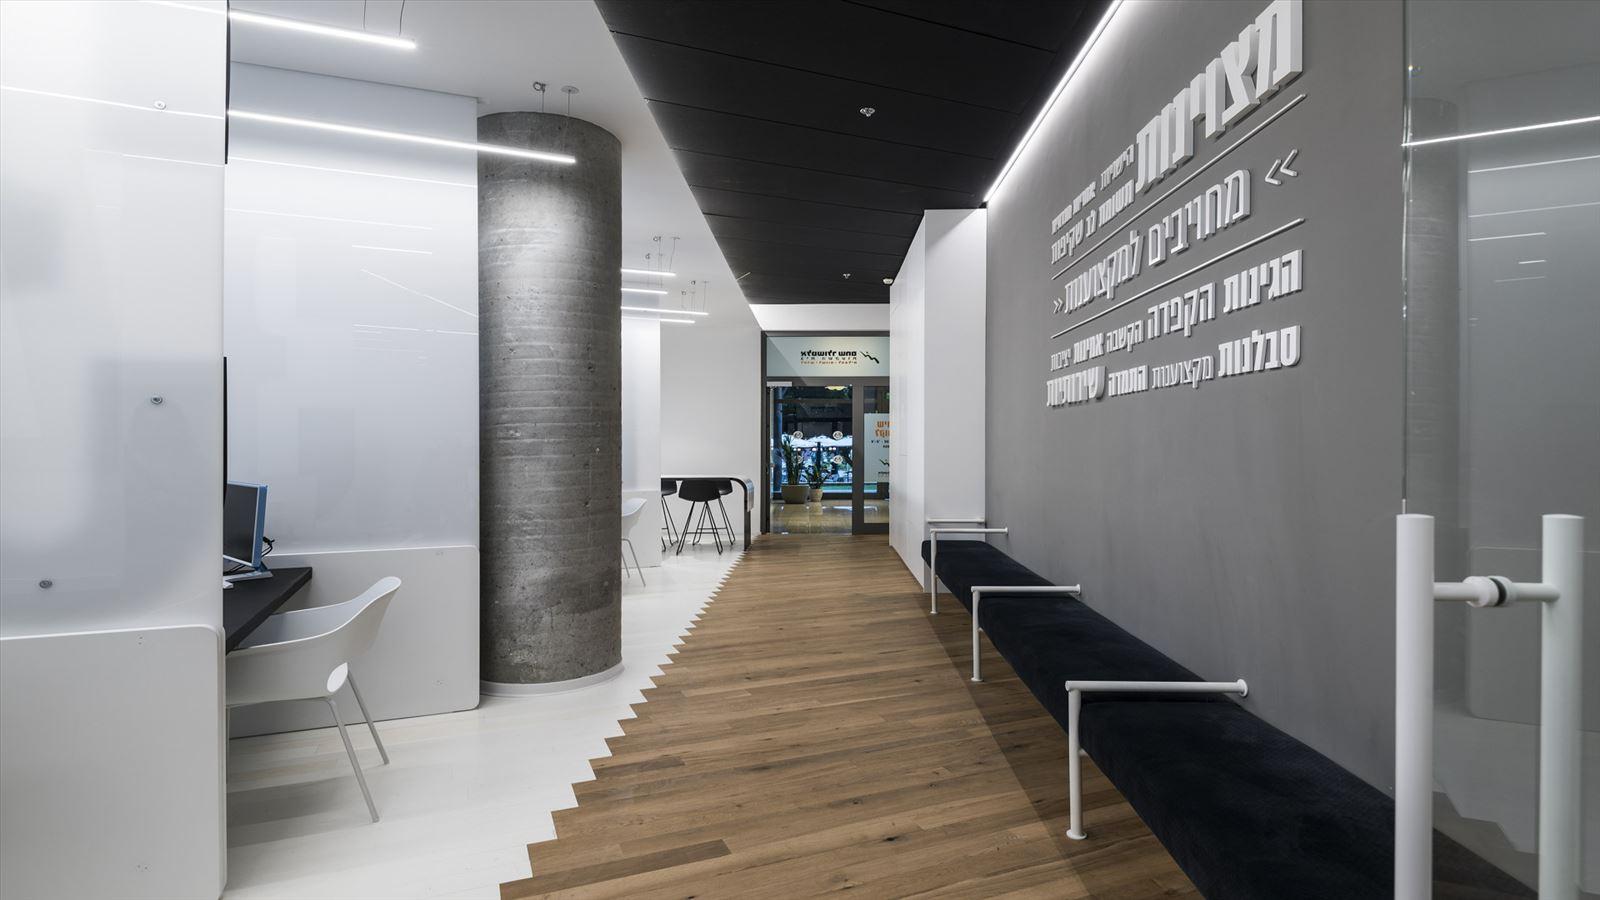 Office lighting project פרויקט תאורה במשרד נעשה על ידי דורי קמחי תאורה אדריכלית